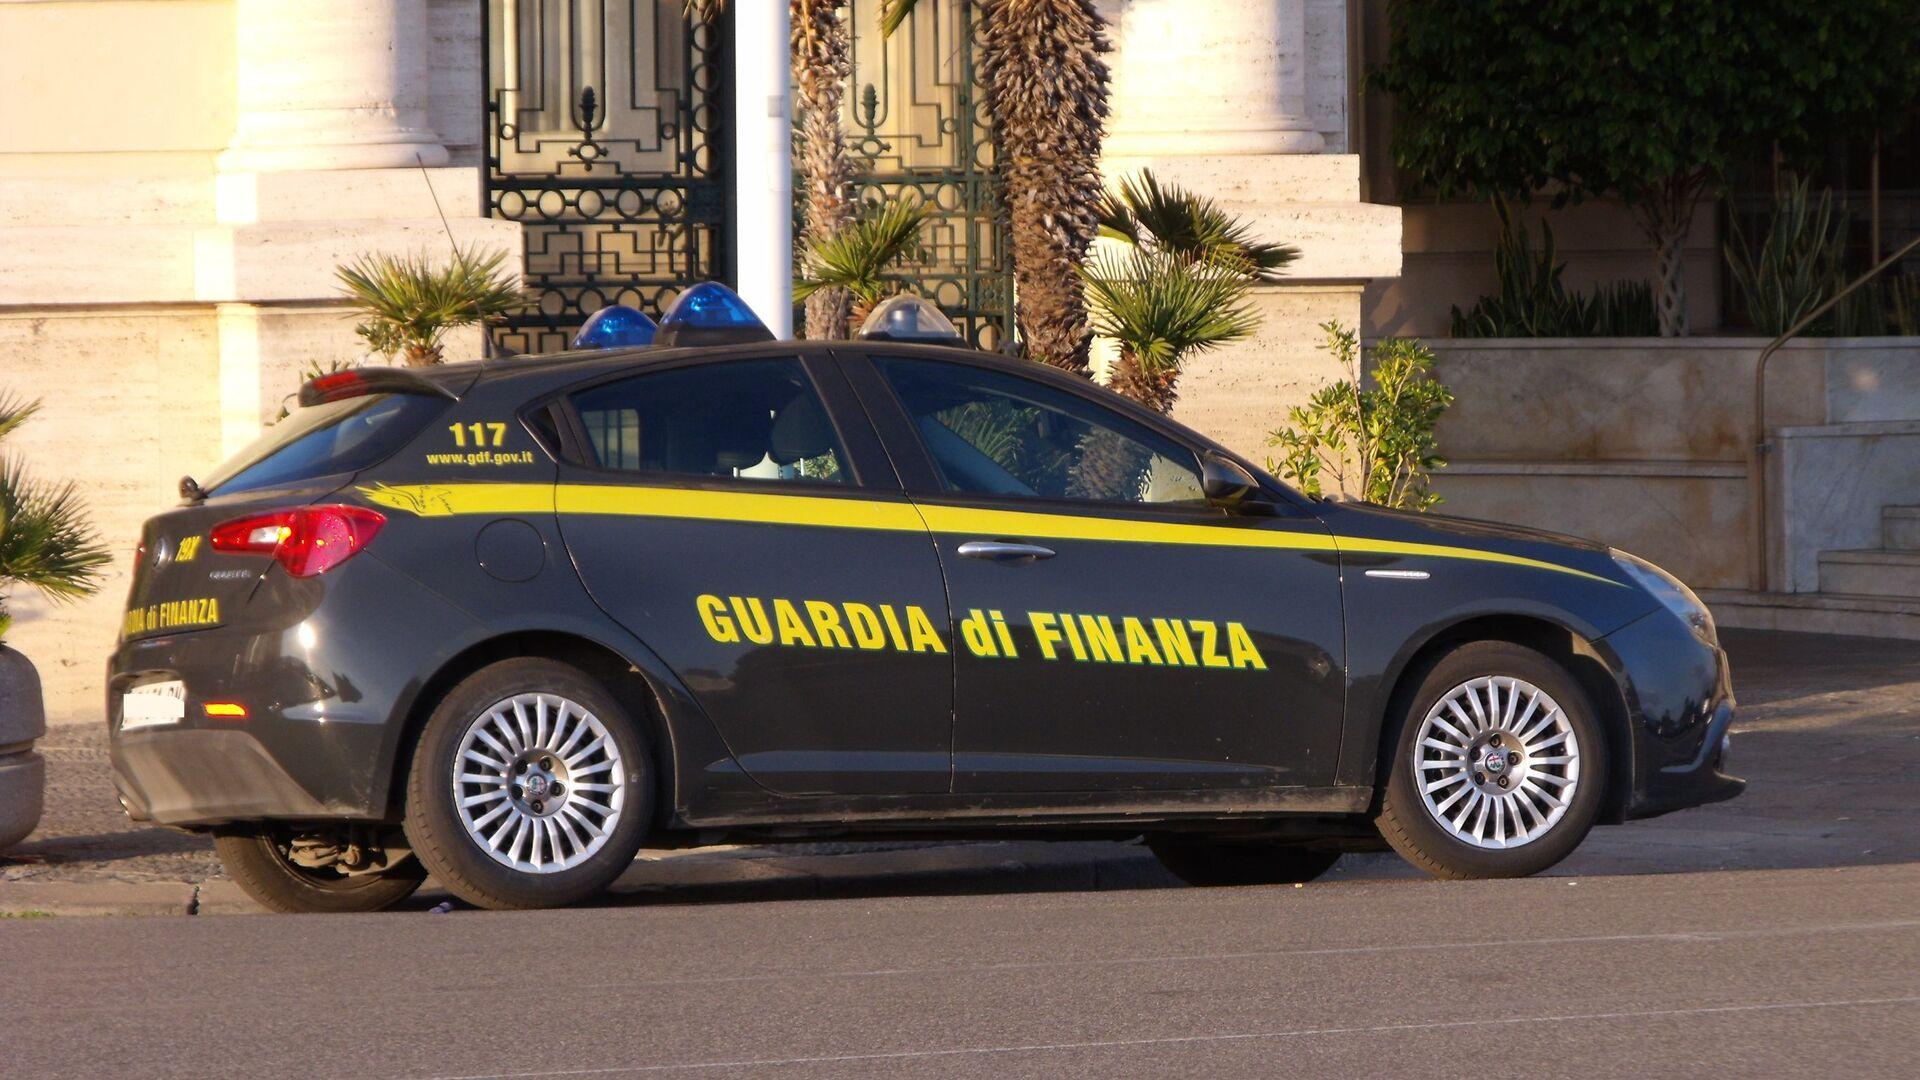 Autovettura guardia di finanza - Sputnik Italia, 1920, 09.04.2021